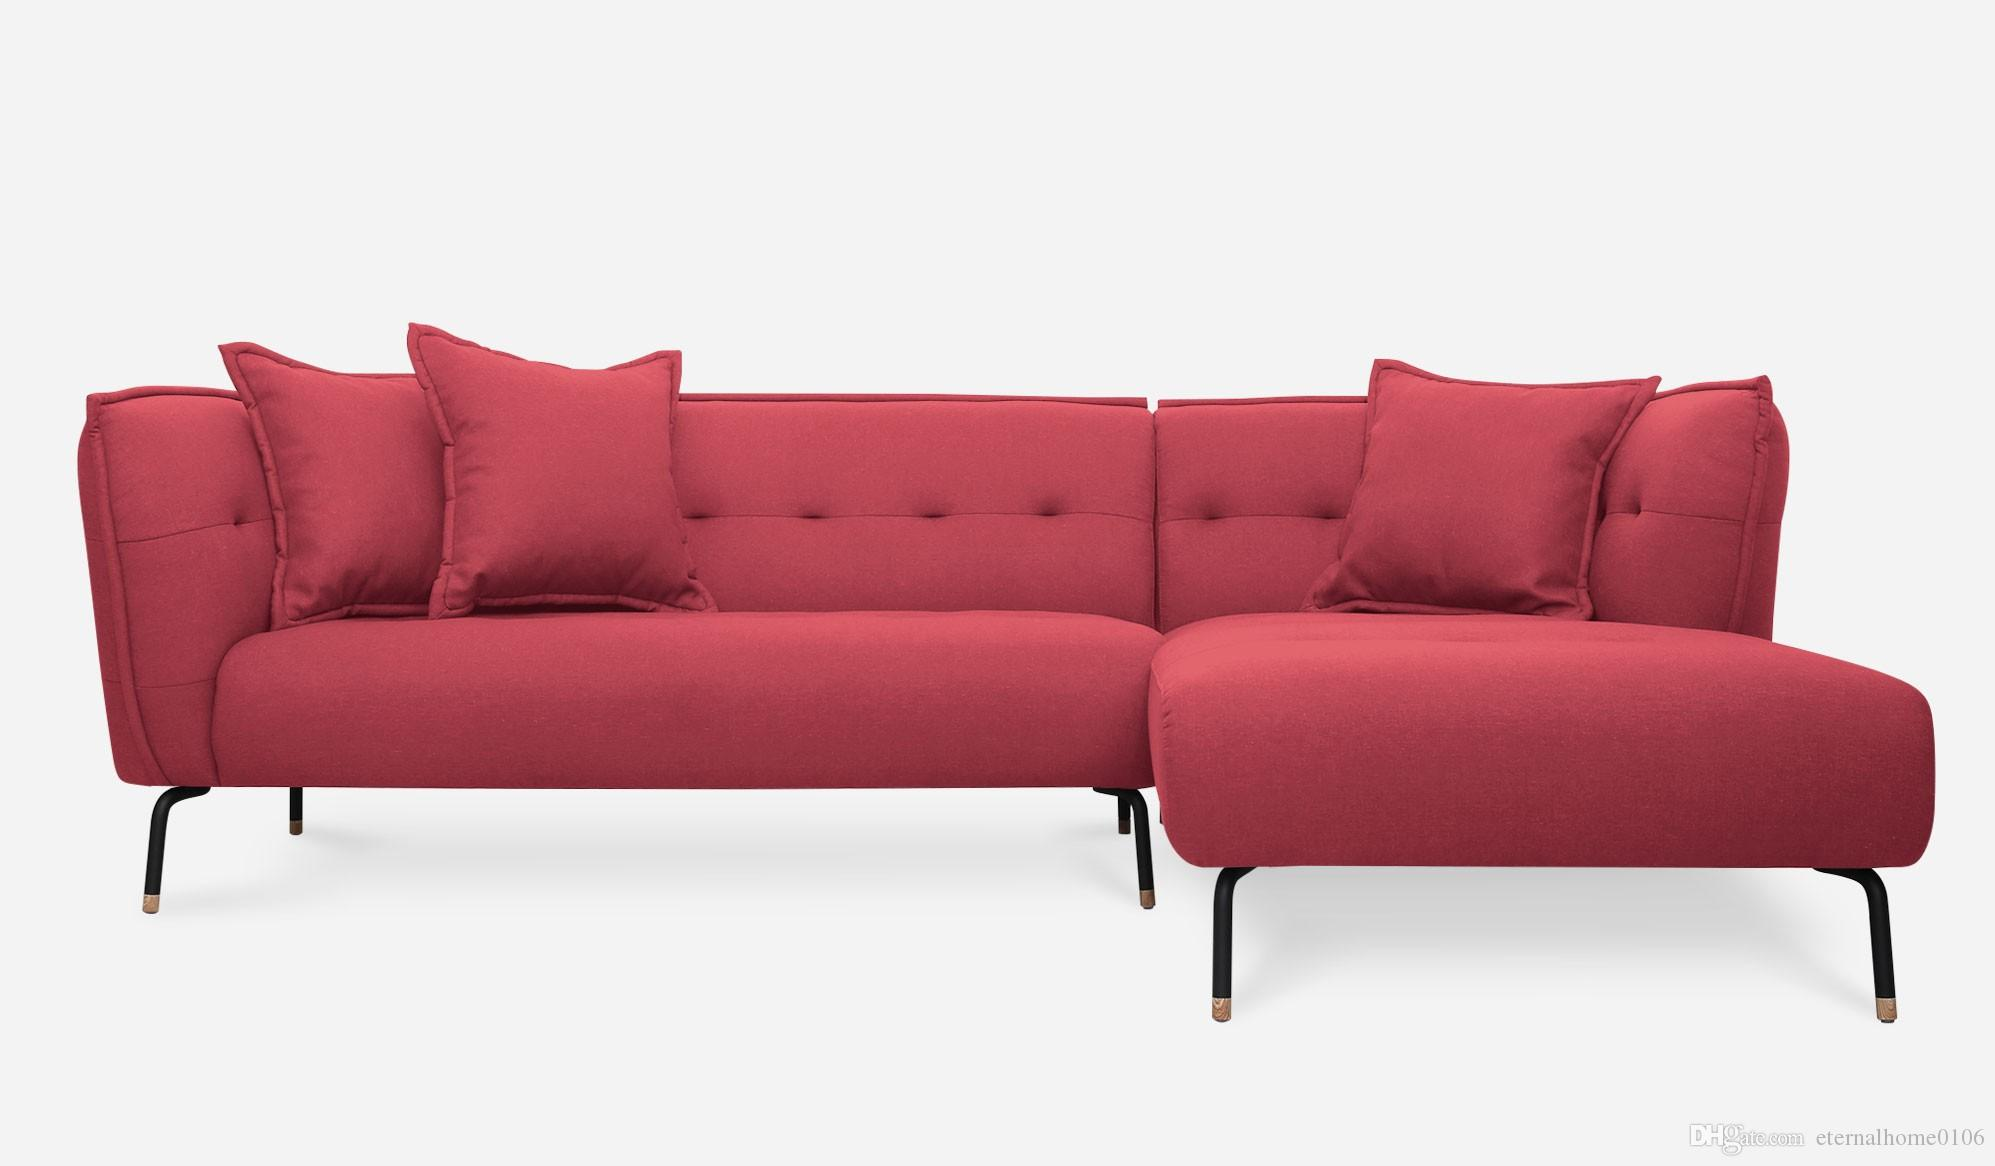 https://www.dhresource.com/0x0s/f2-albu-g4-M00-43-B7-rBVaEVmaquuATr5AAAJoKiYnoJA121.jpg/mid-century-modern-loveseats-furniture-lounger.jpg